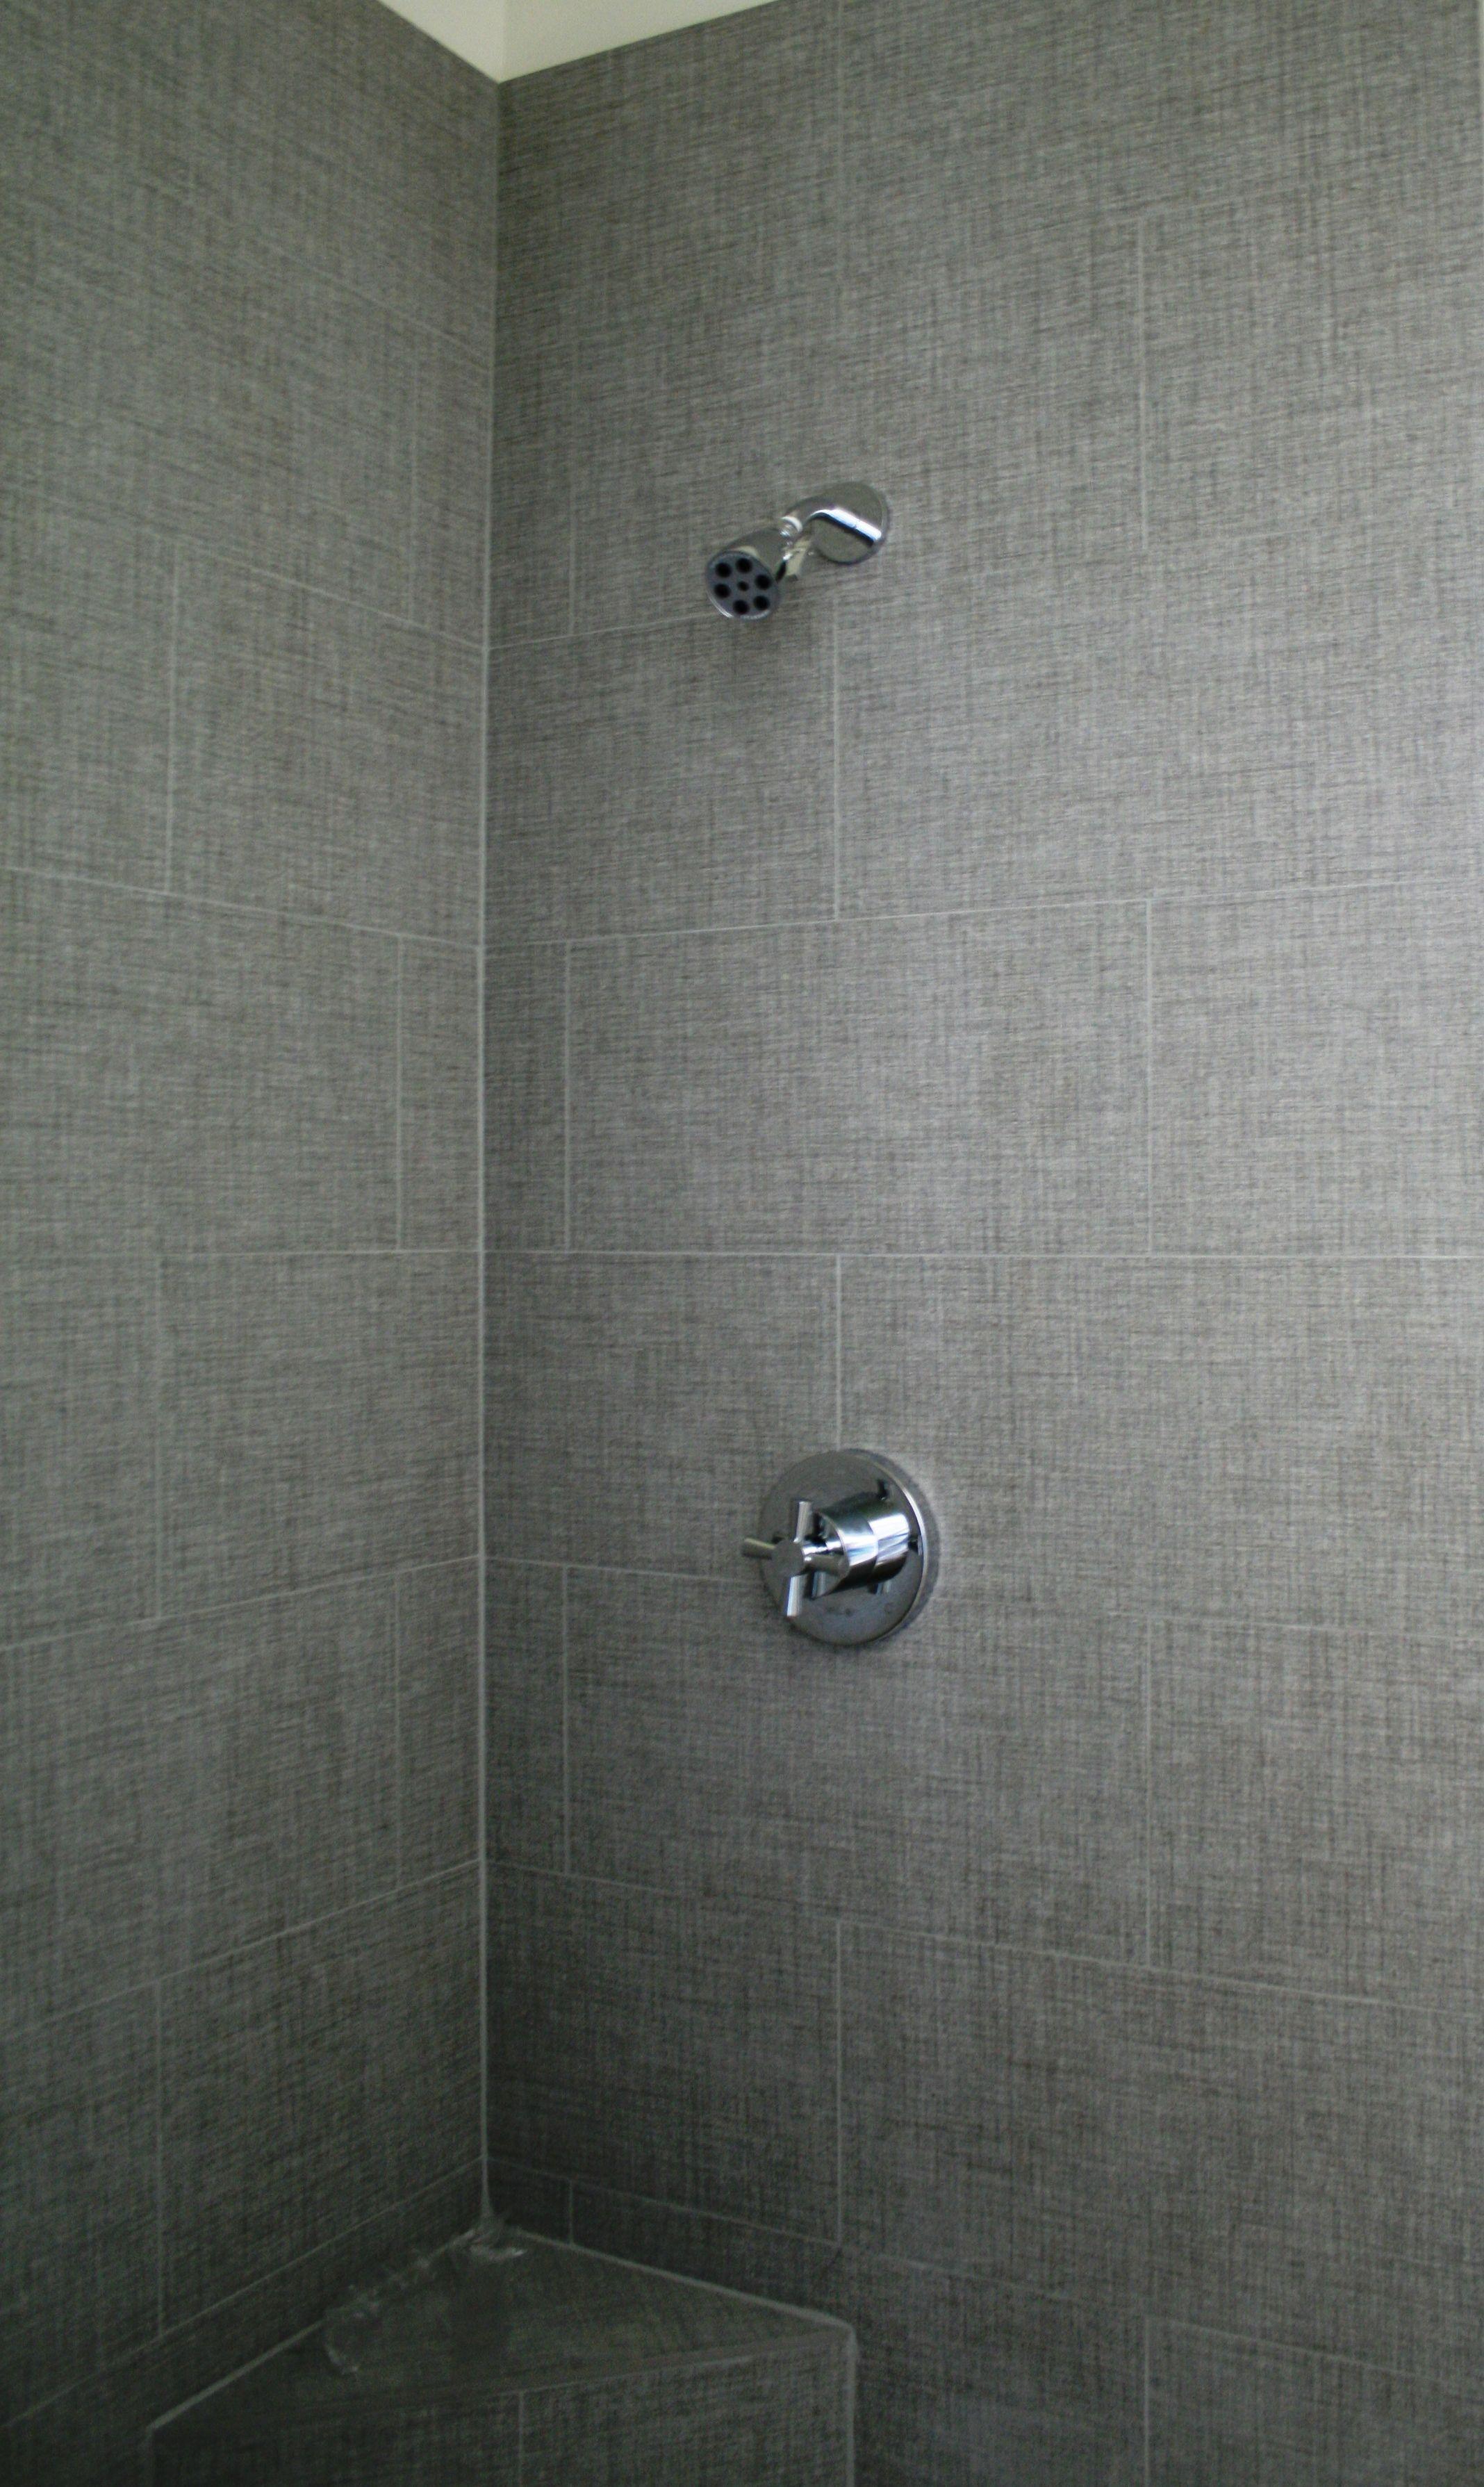 Linen Textured Tile From Jenkins Brick Bathroom Floor Tiles Floor Tile Grout Bathroom Flooring